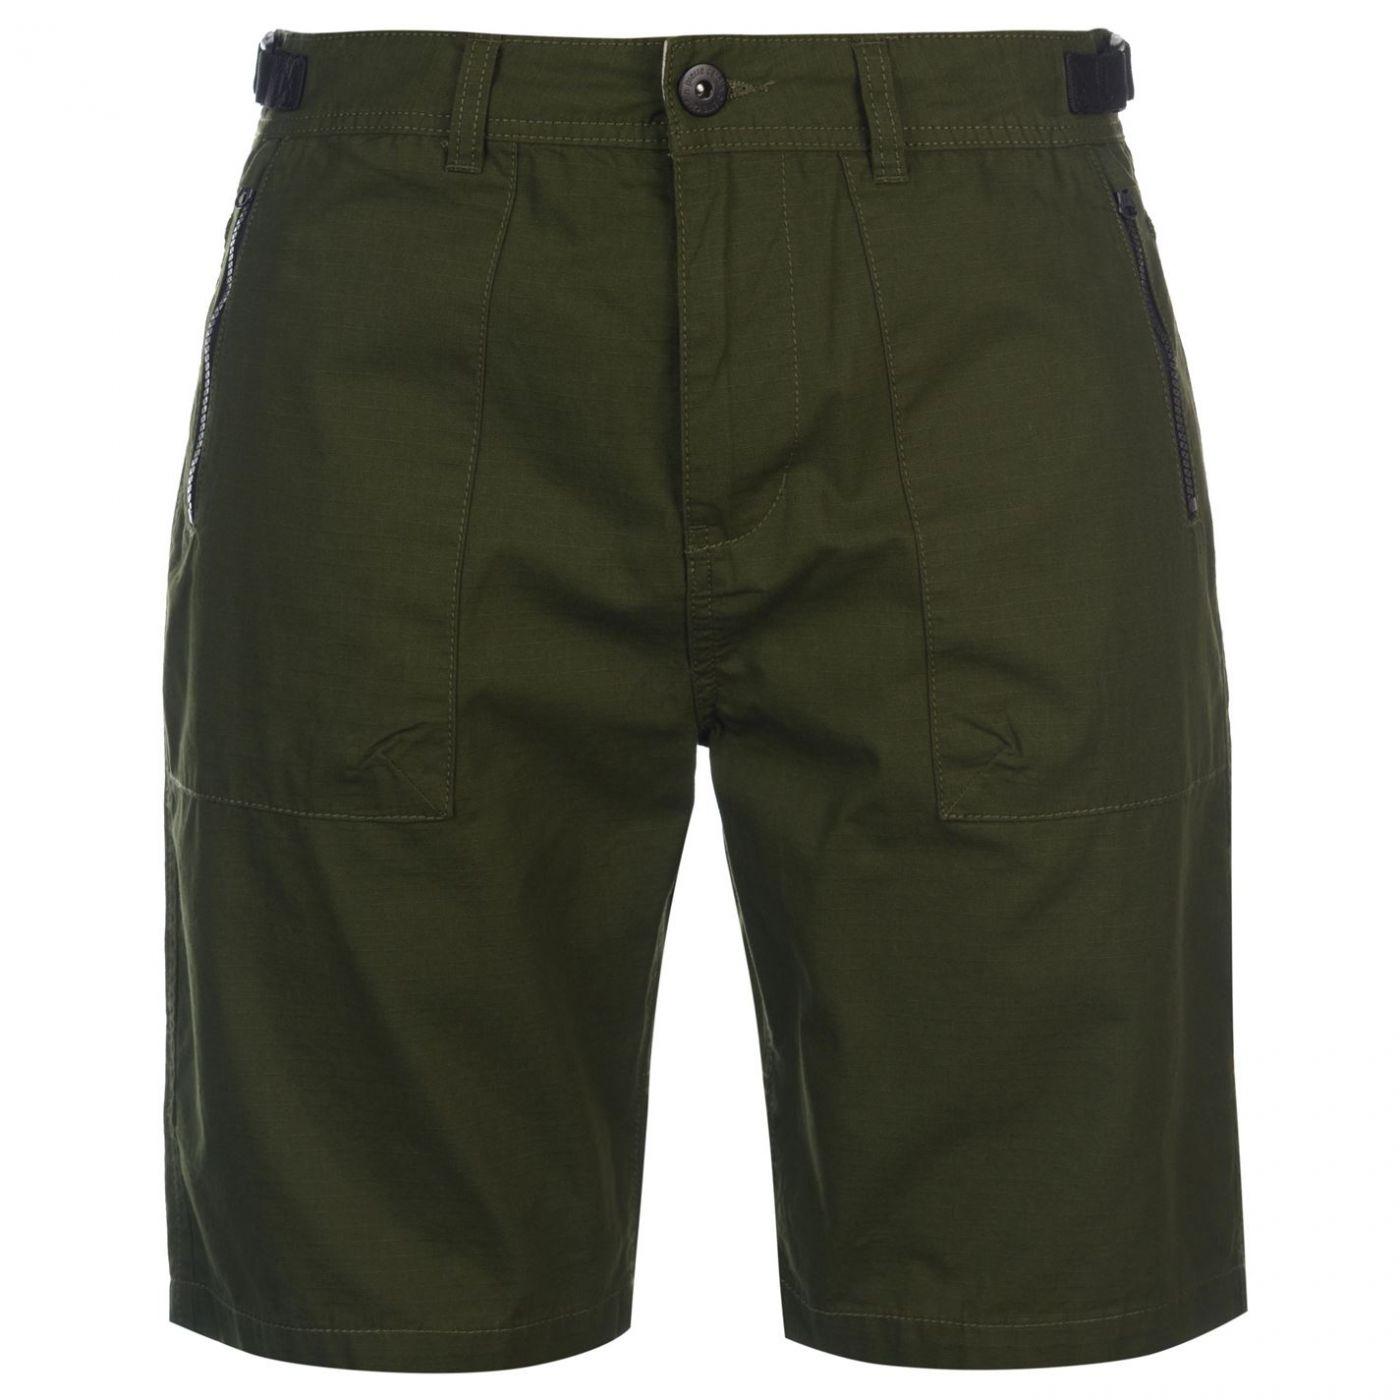 Pierre Cardin Utility Shorts Mens